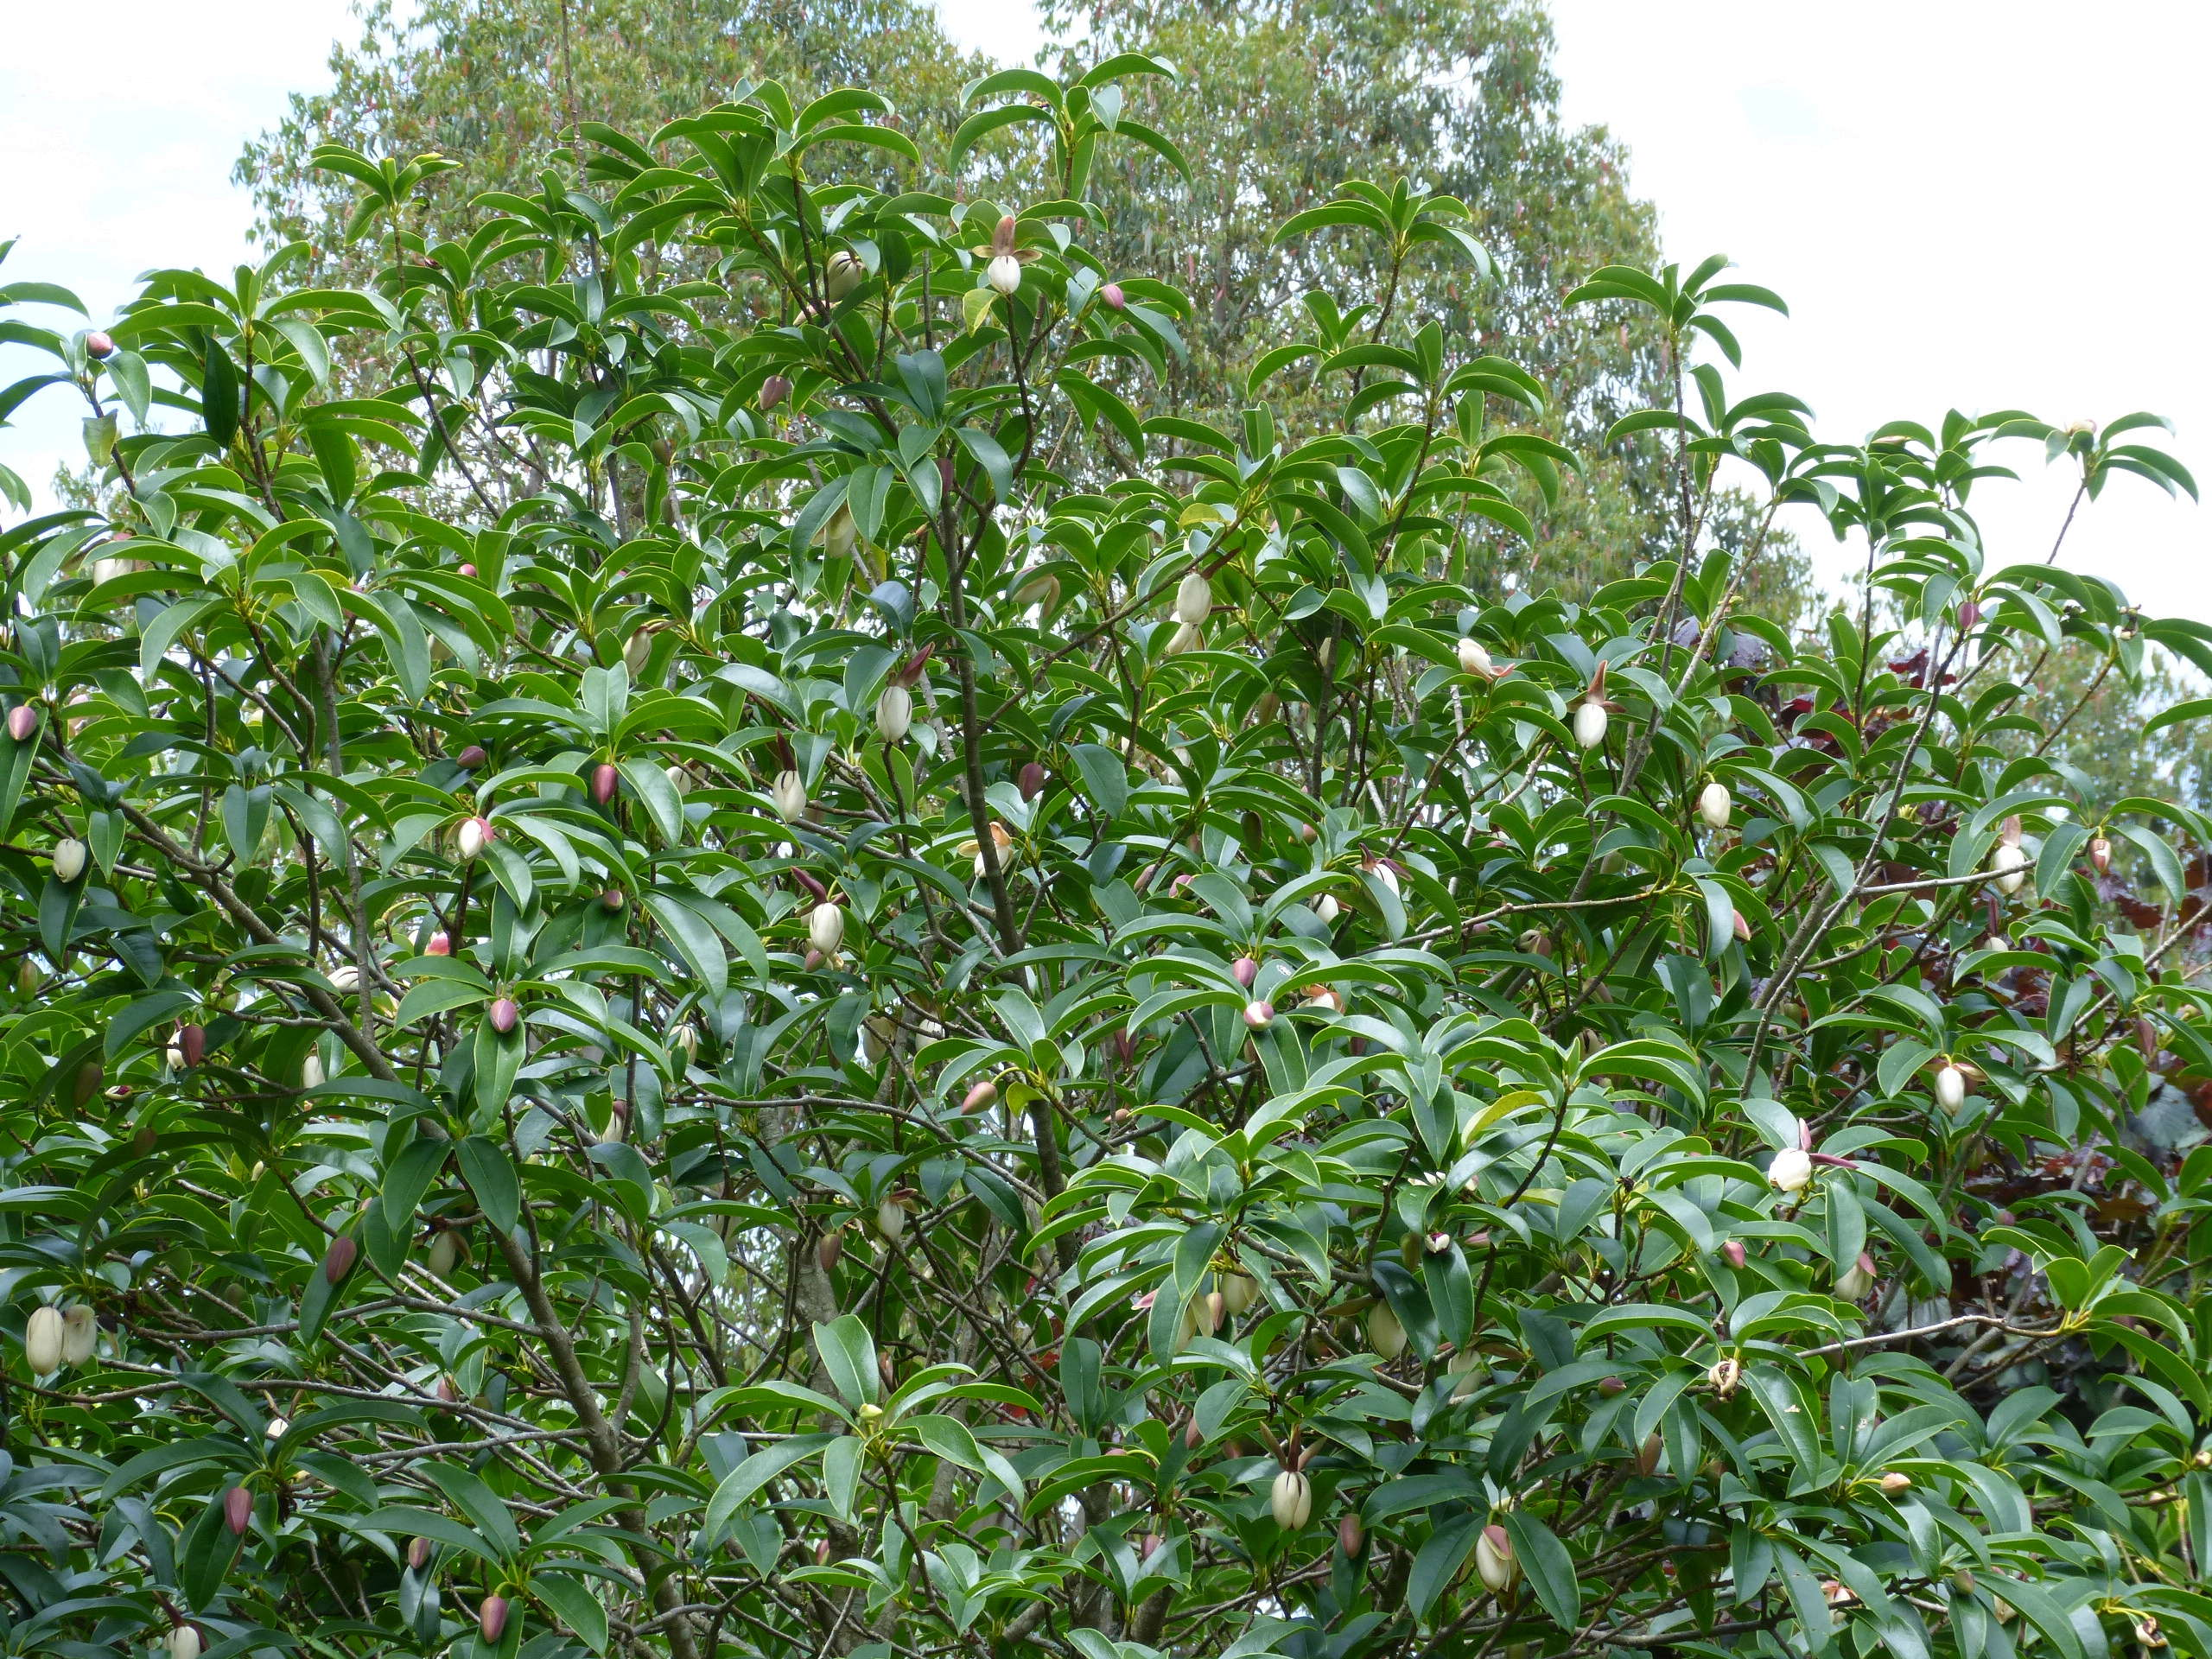 Magnolia conifera var. chingii (= Manglietia chingii) Mangli17